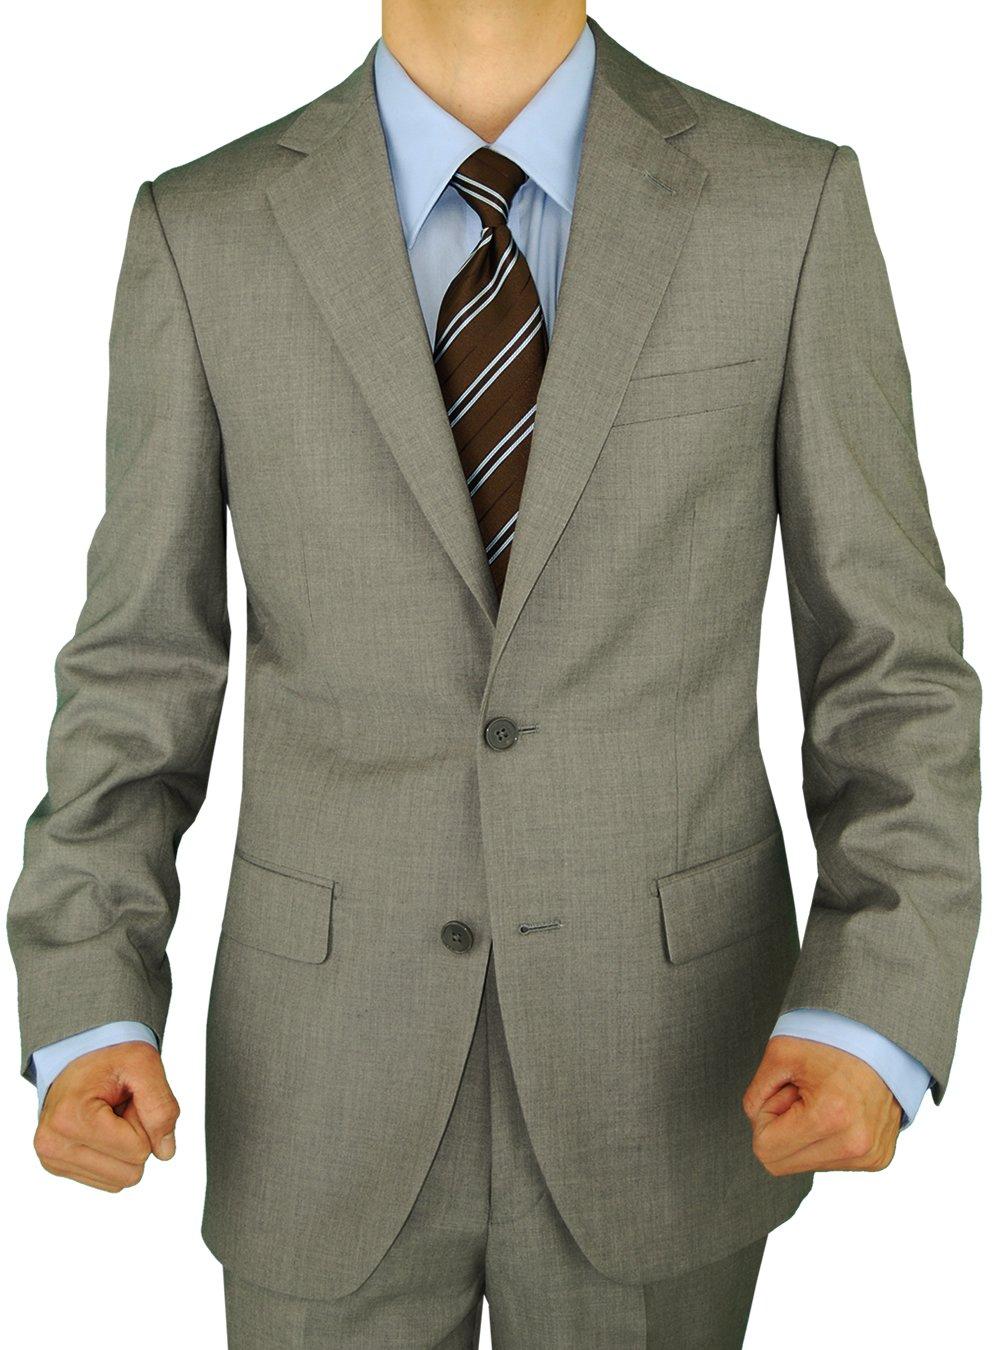 GN GIORGIO NAPOLI Presidential Men's 2 Button Suit Separate Coat Blazer (42 Short US, Light Gray)